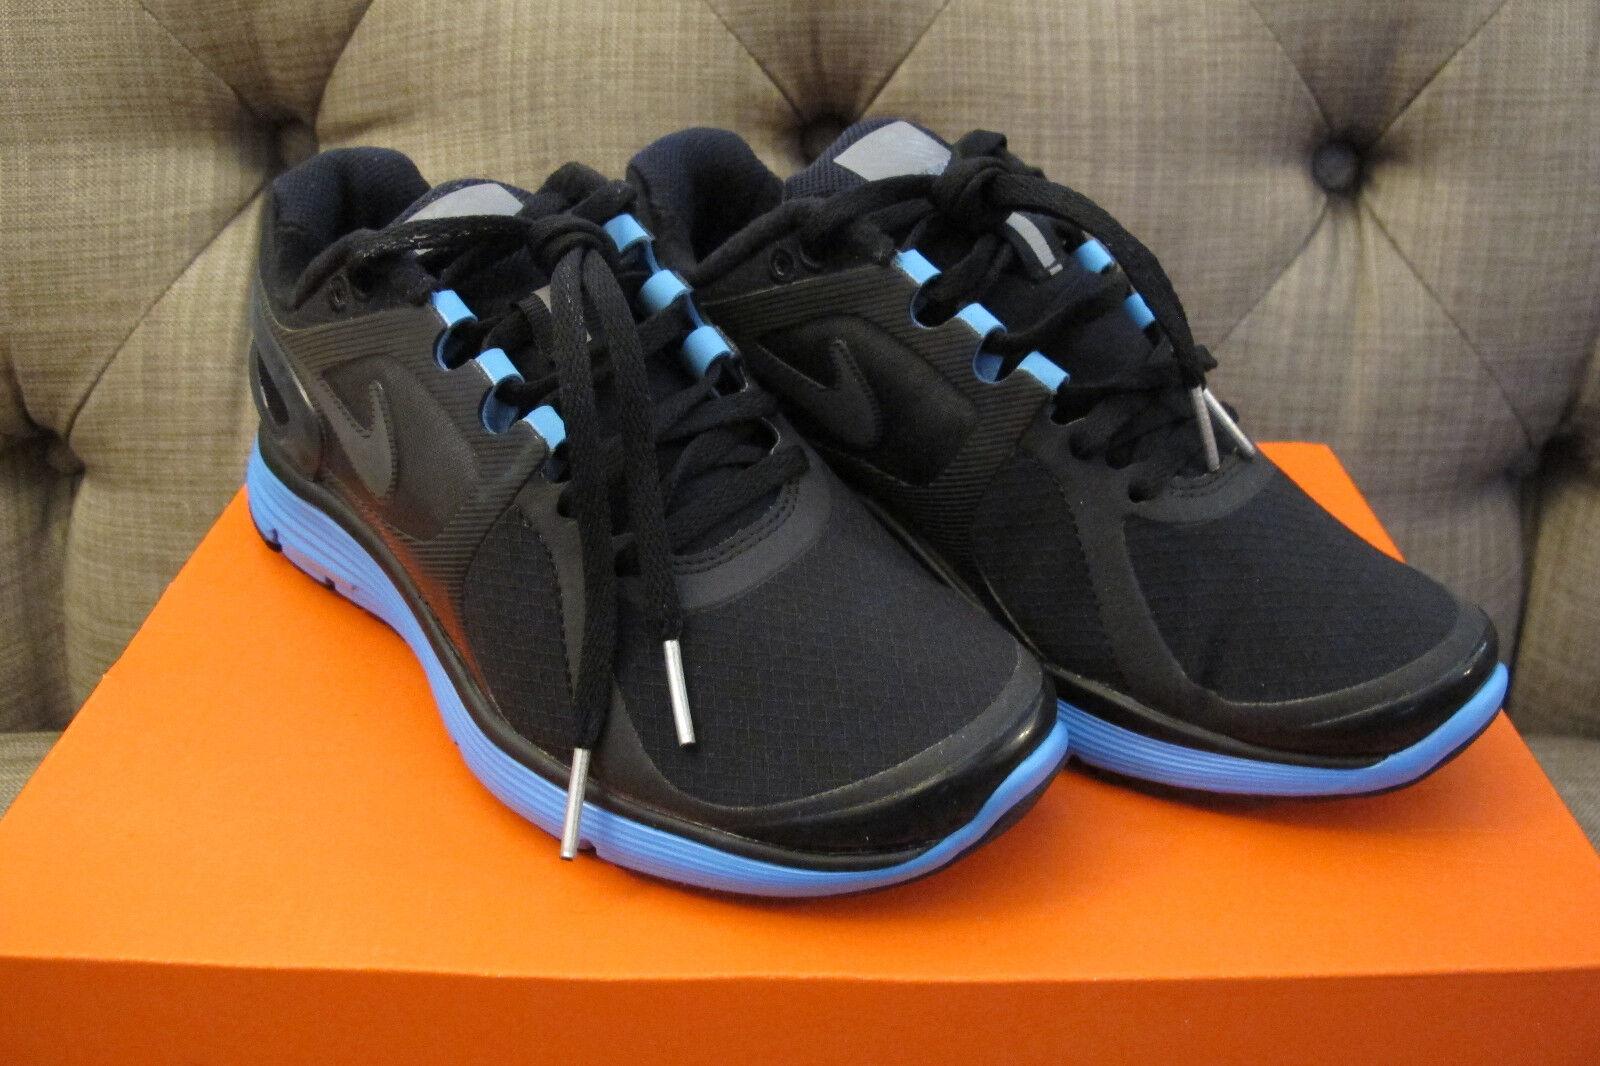 NIKE Shoe Lunareclipse+ 2 Women's Running Shoe NIKE Black/Dk Grey-University Blue 5.5 NIB 221342